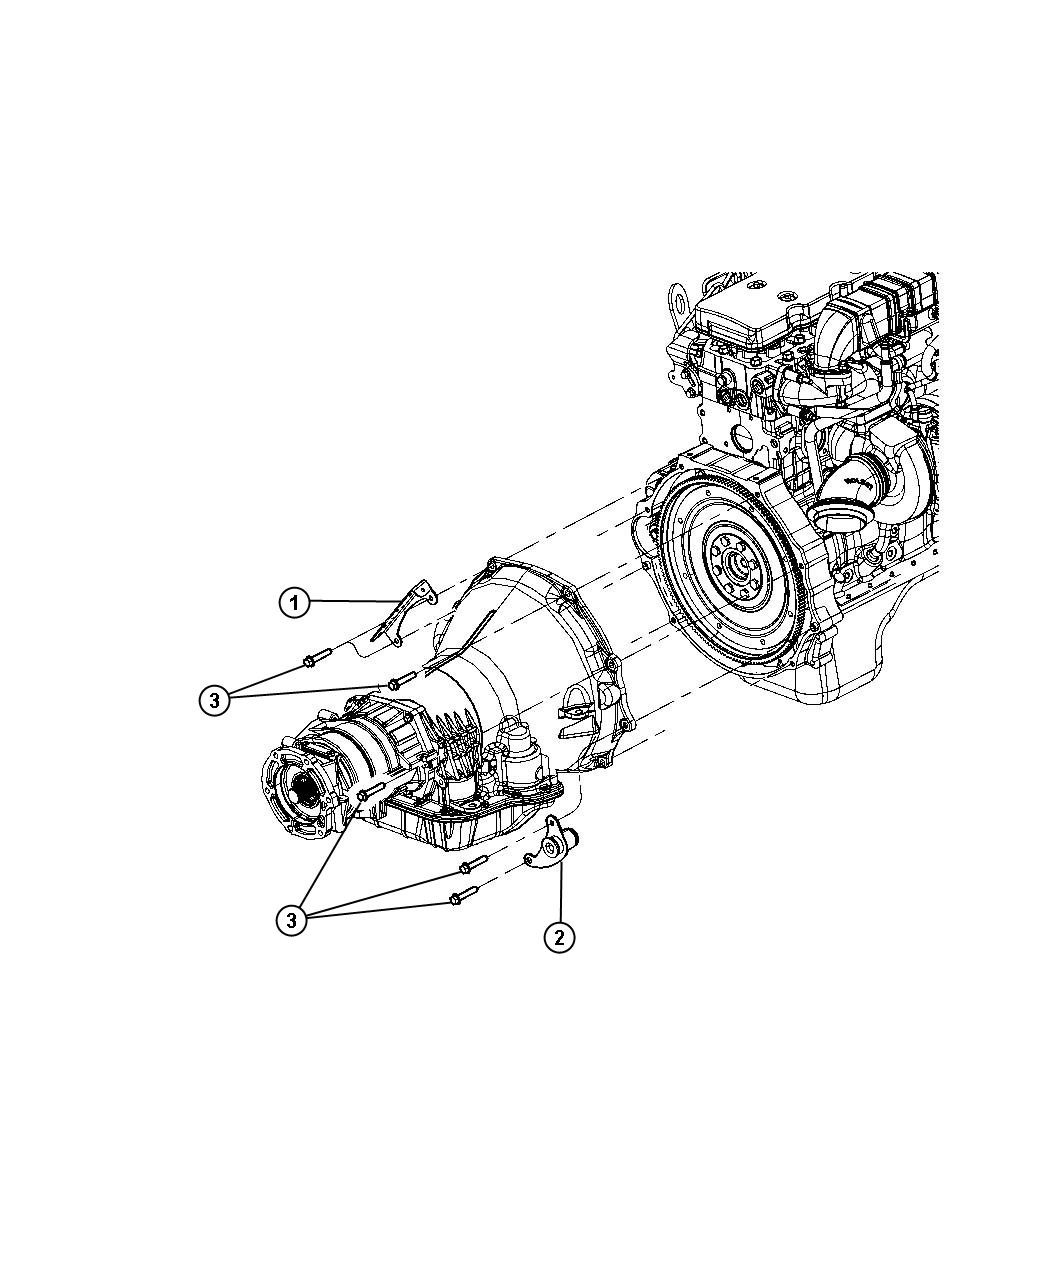 Dodge Ram 3500 Bracket. Transmission line. Trans wiring